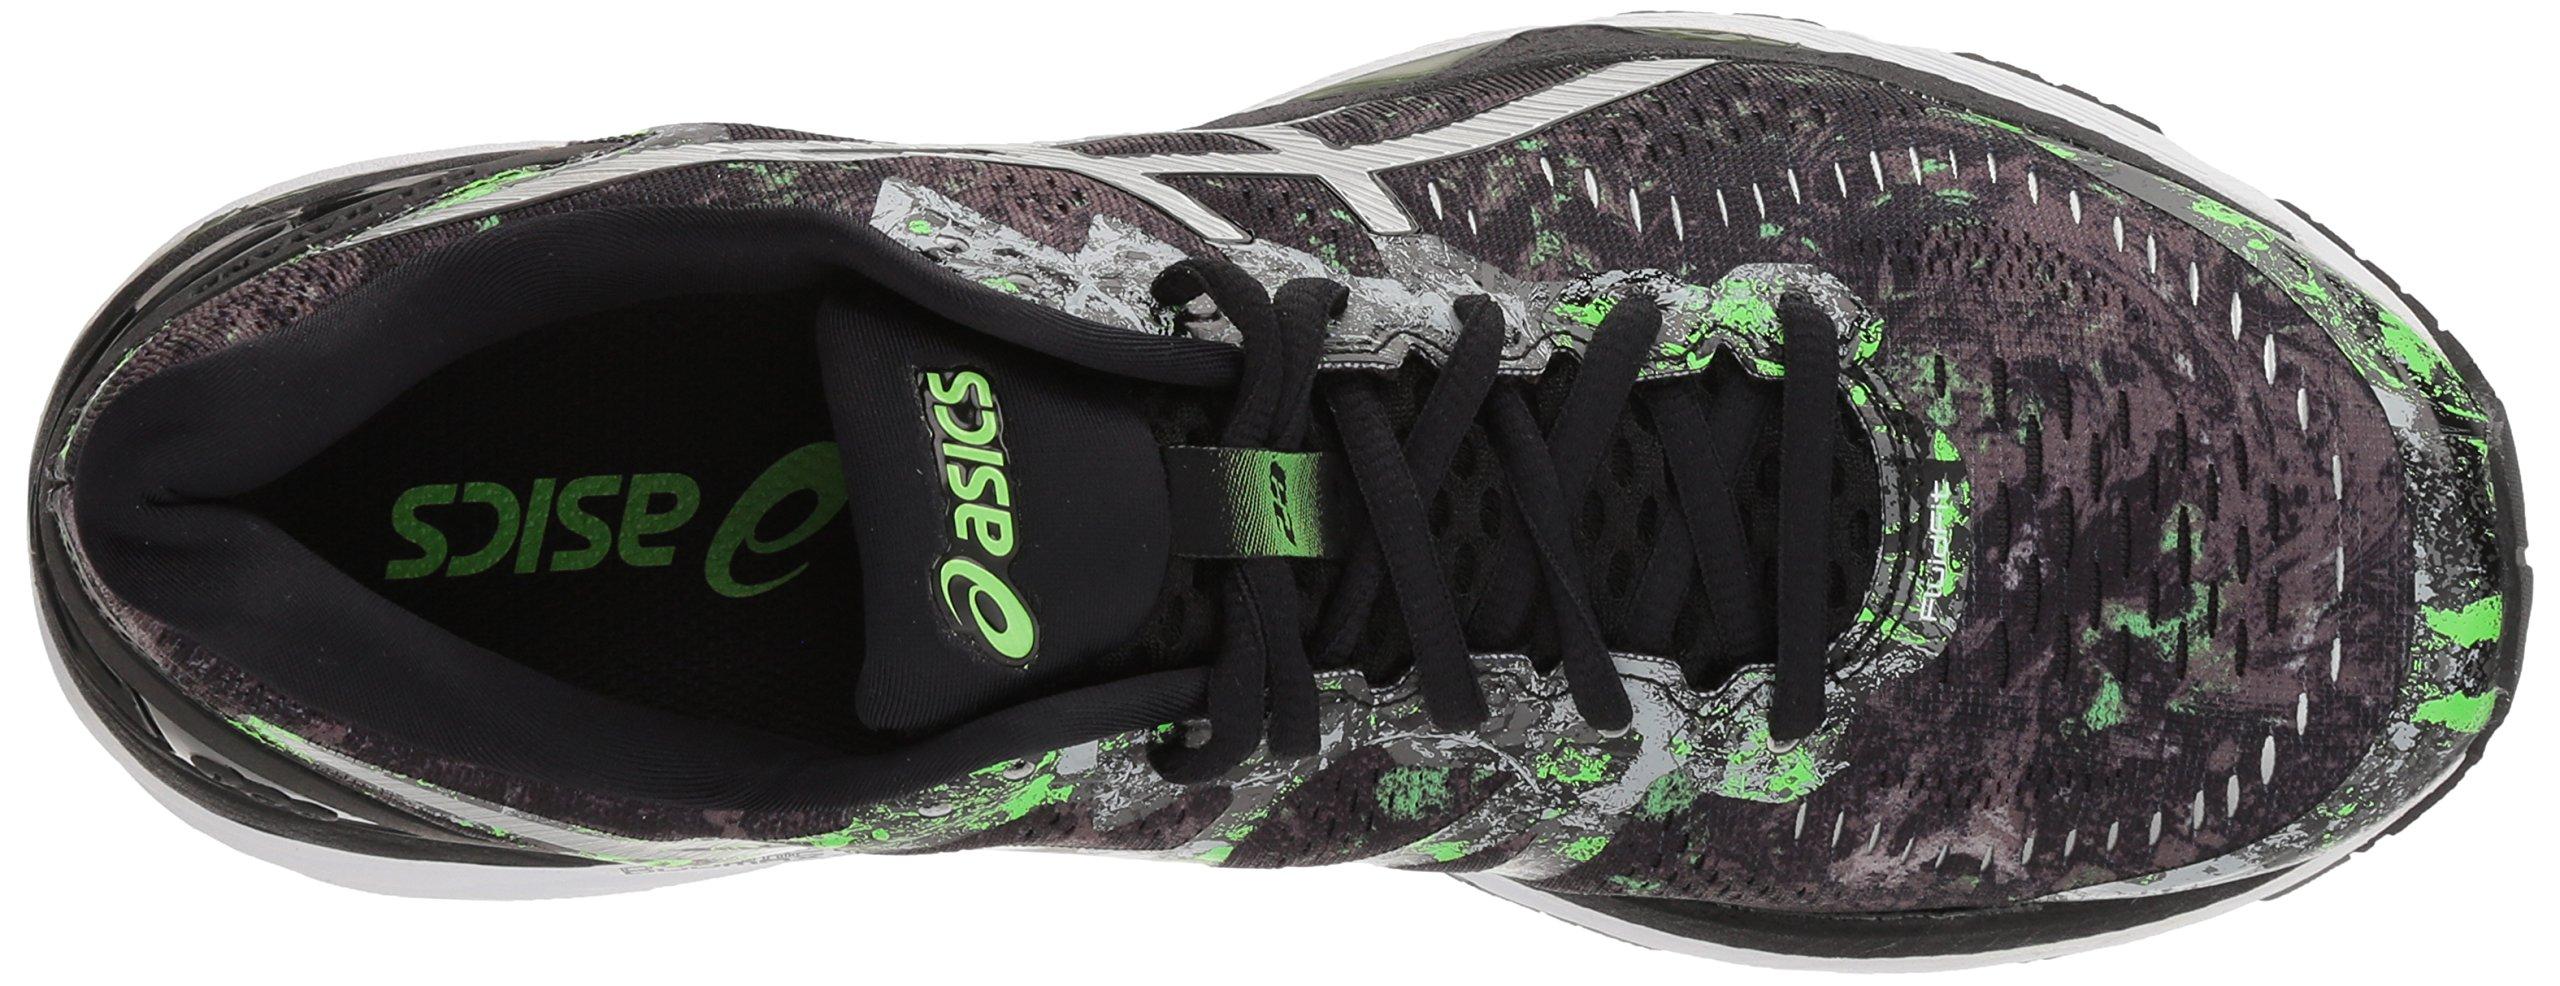 81qtO0 hUHL - ASICS Men's Gel-Kayano 23 Running Shoe